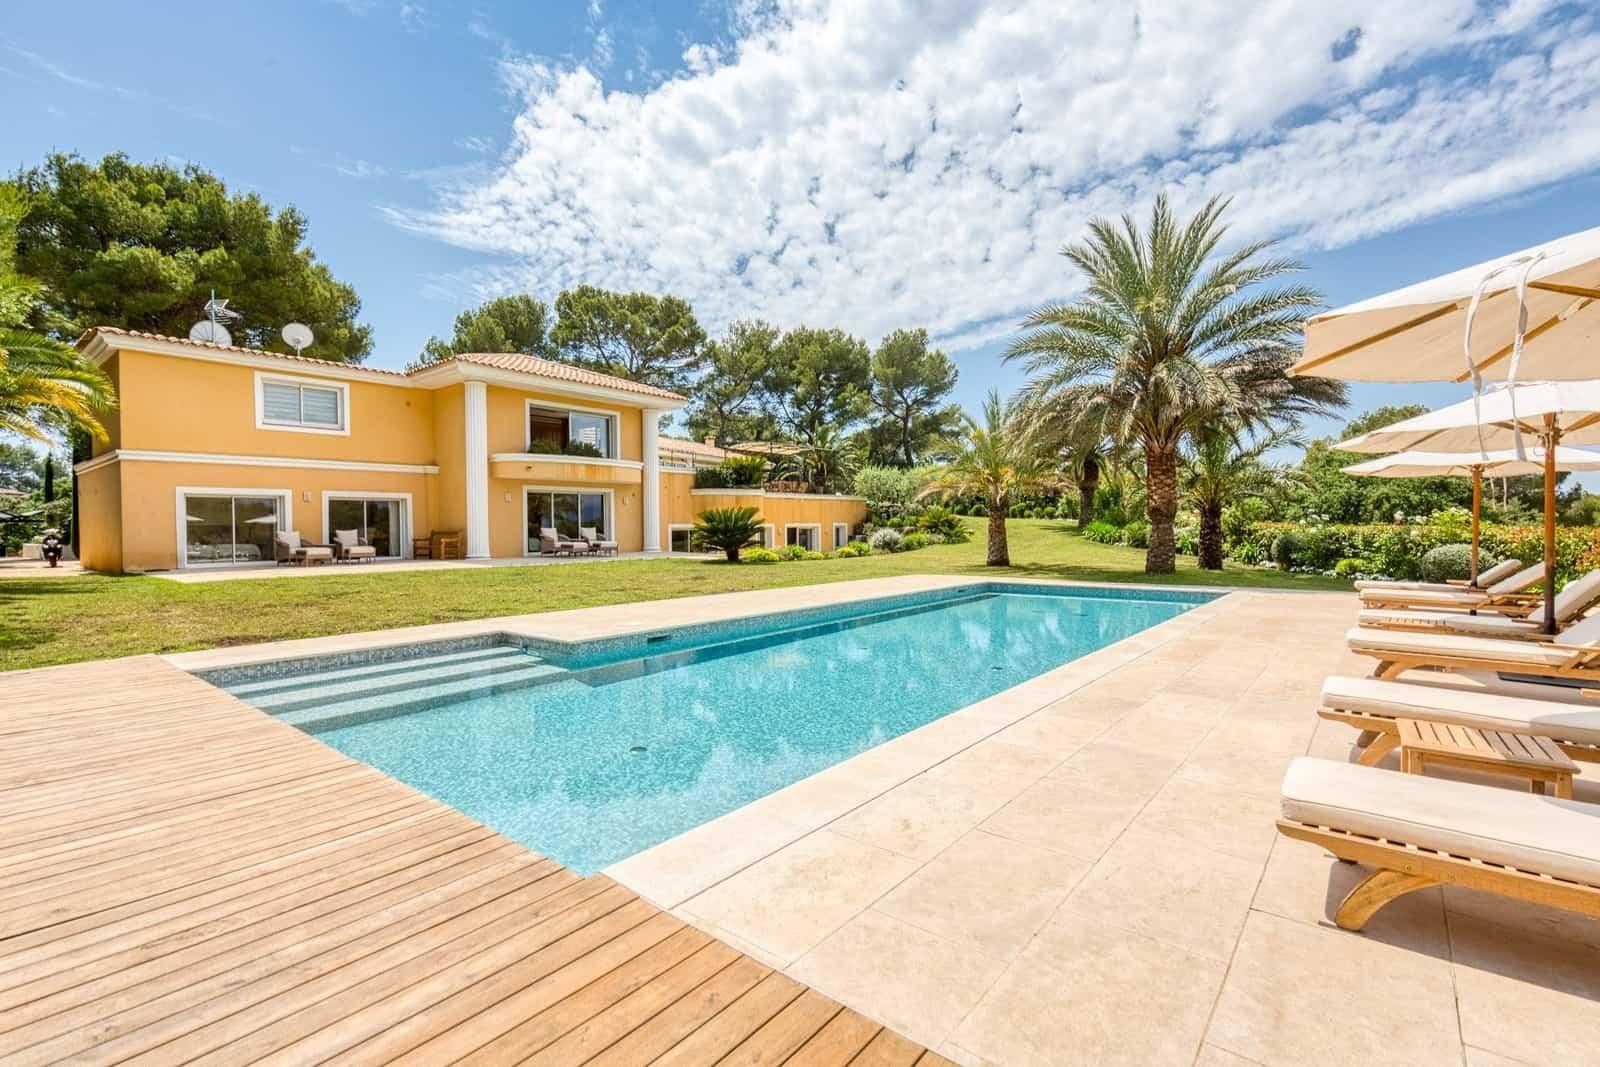 villa-style-provencal-a-vendre-mougins-cheminee-terrasses-jardin-paysager-piscine-chauffee